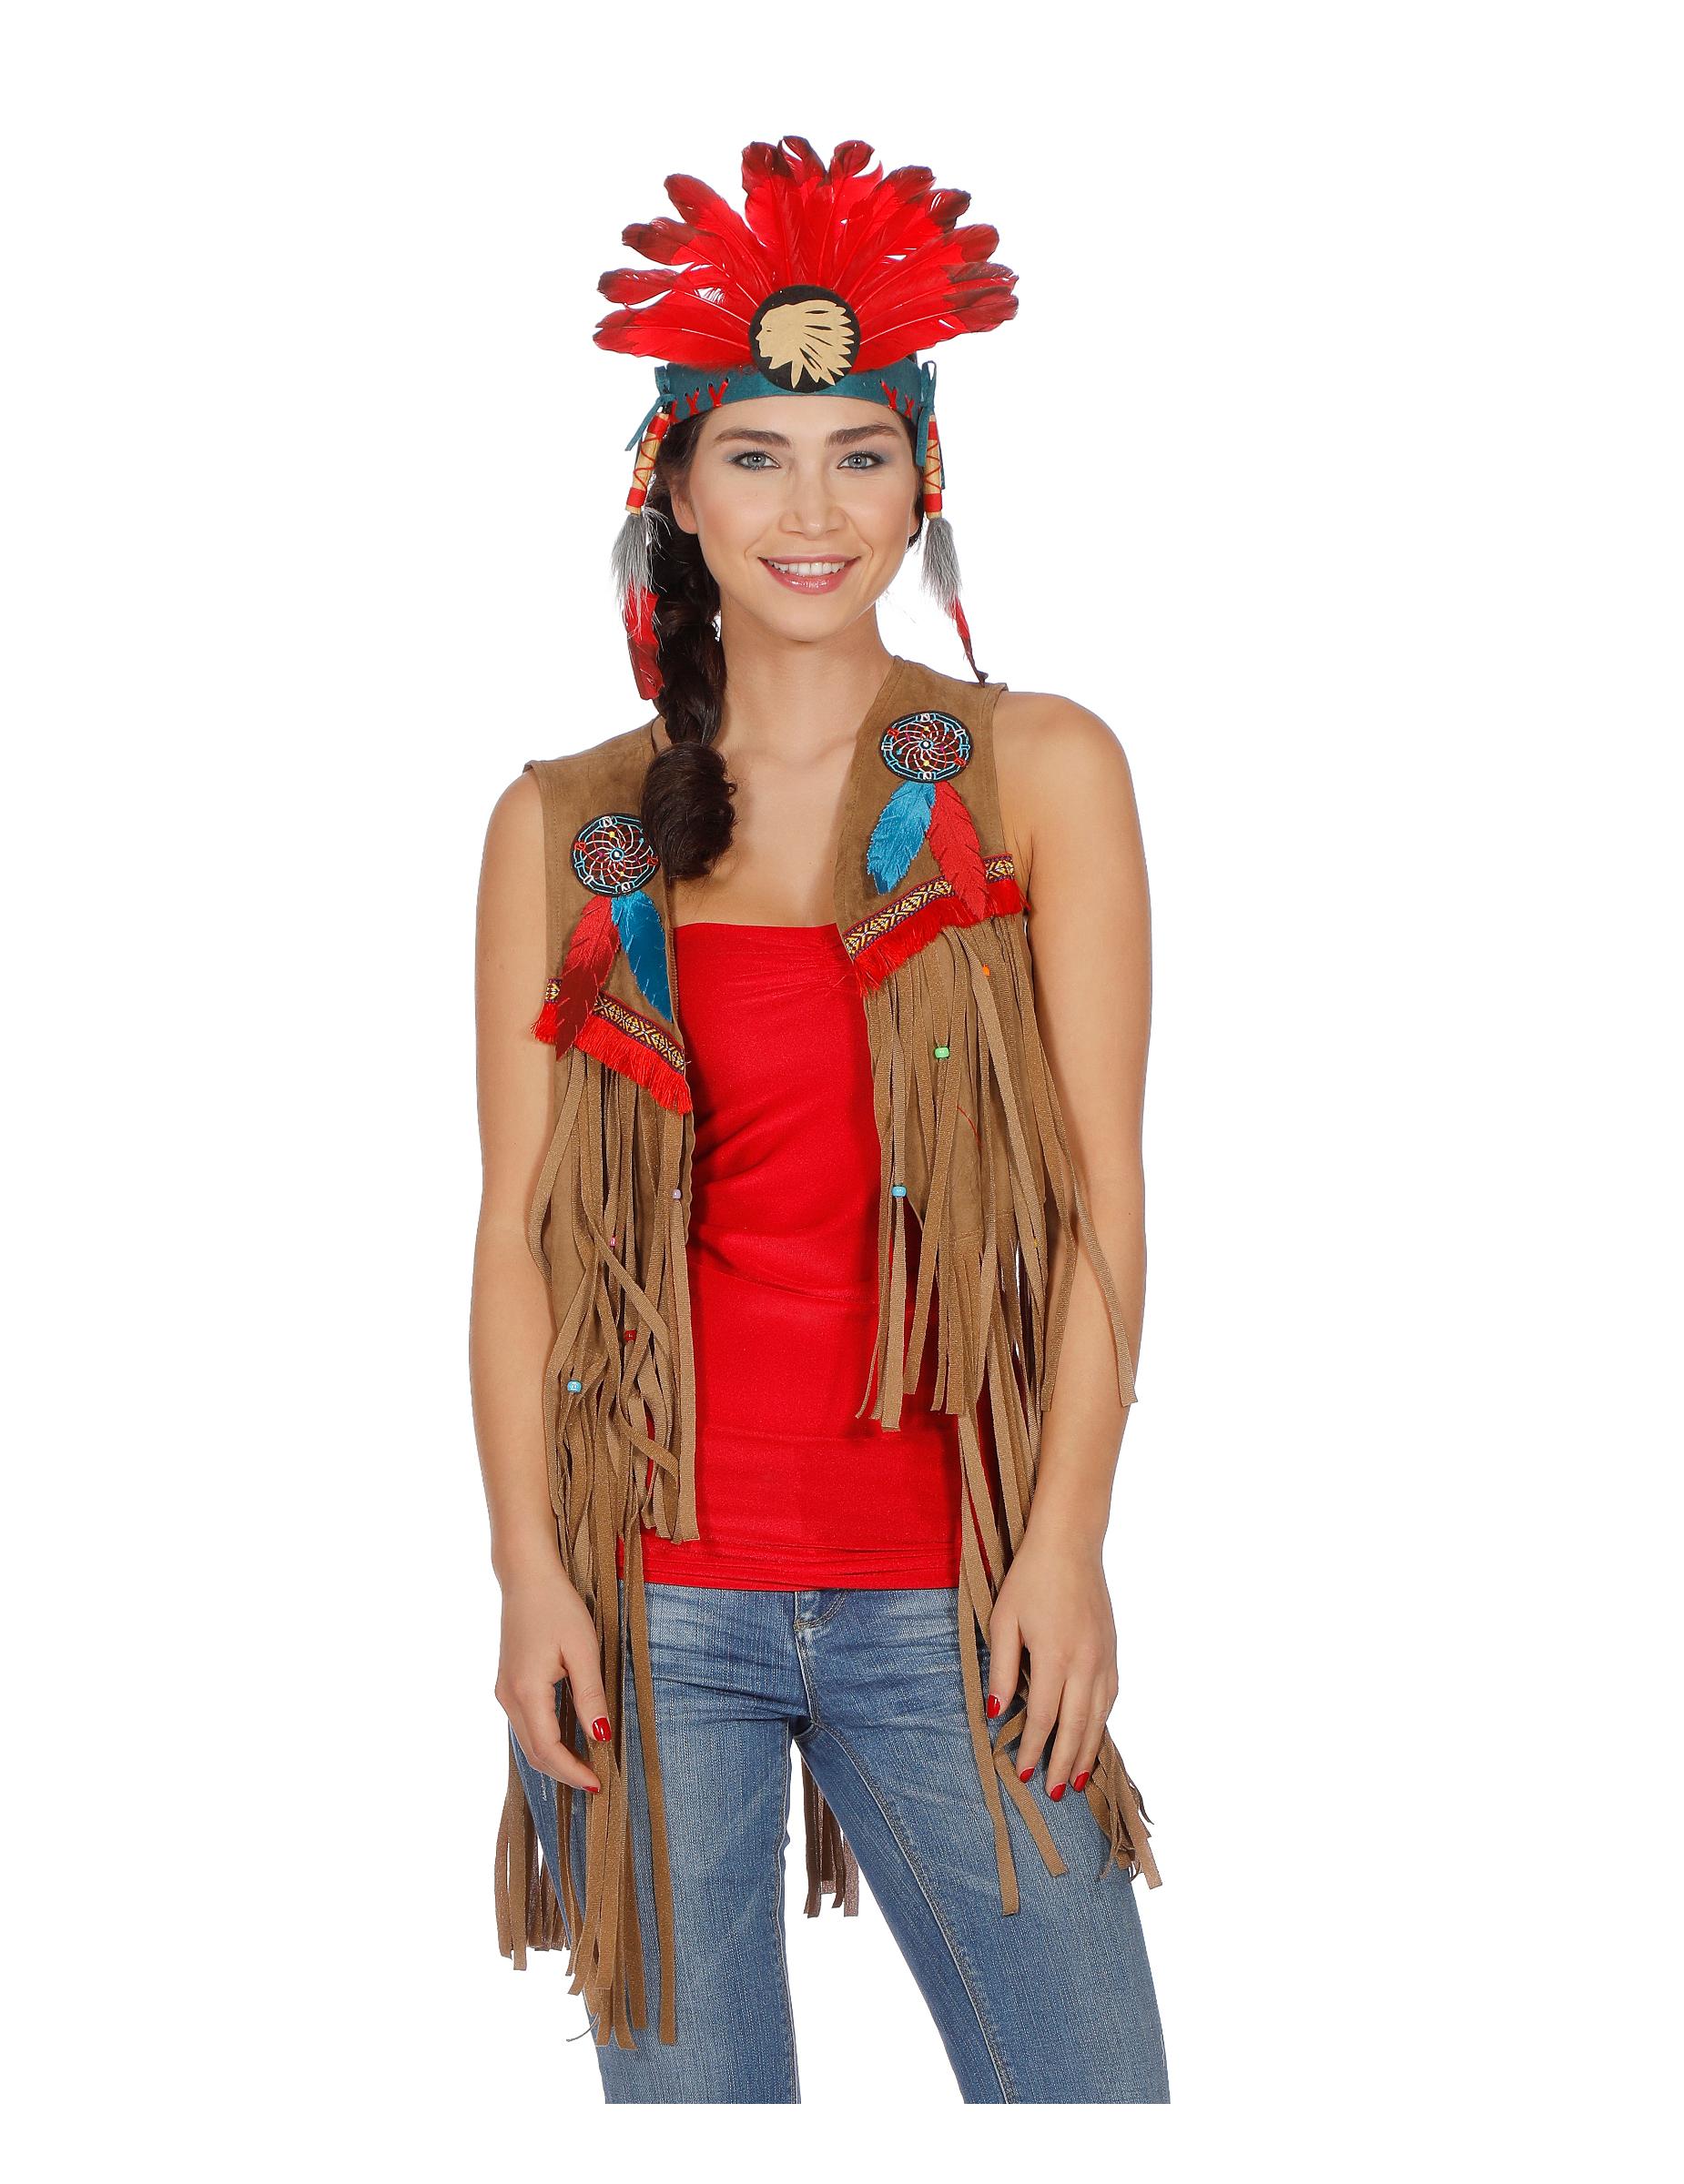 indianer weste f r damen kost me f r erwachsene und g nstige faschingskost me vegaoo. Black Bedroom Furniture Sets. Home Design Ideas